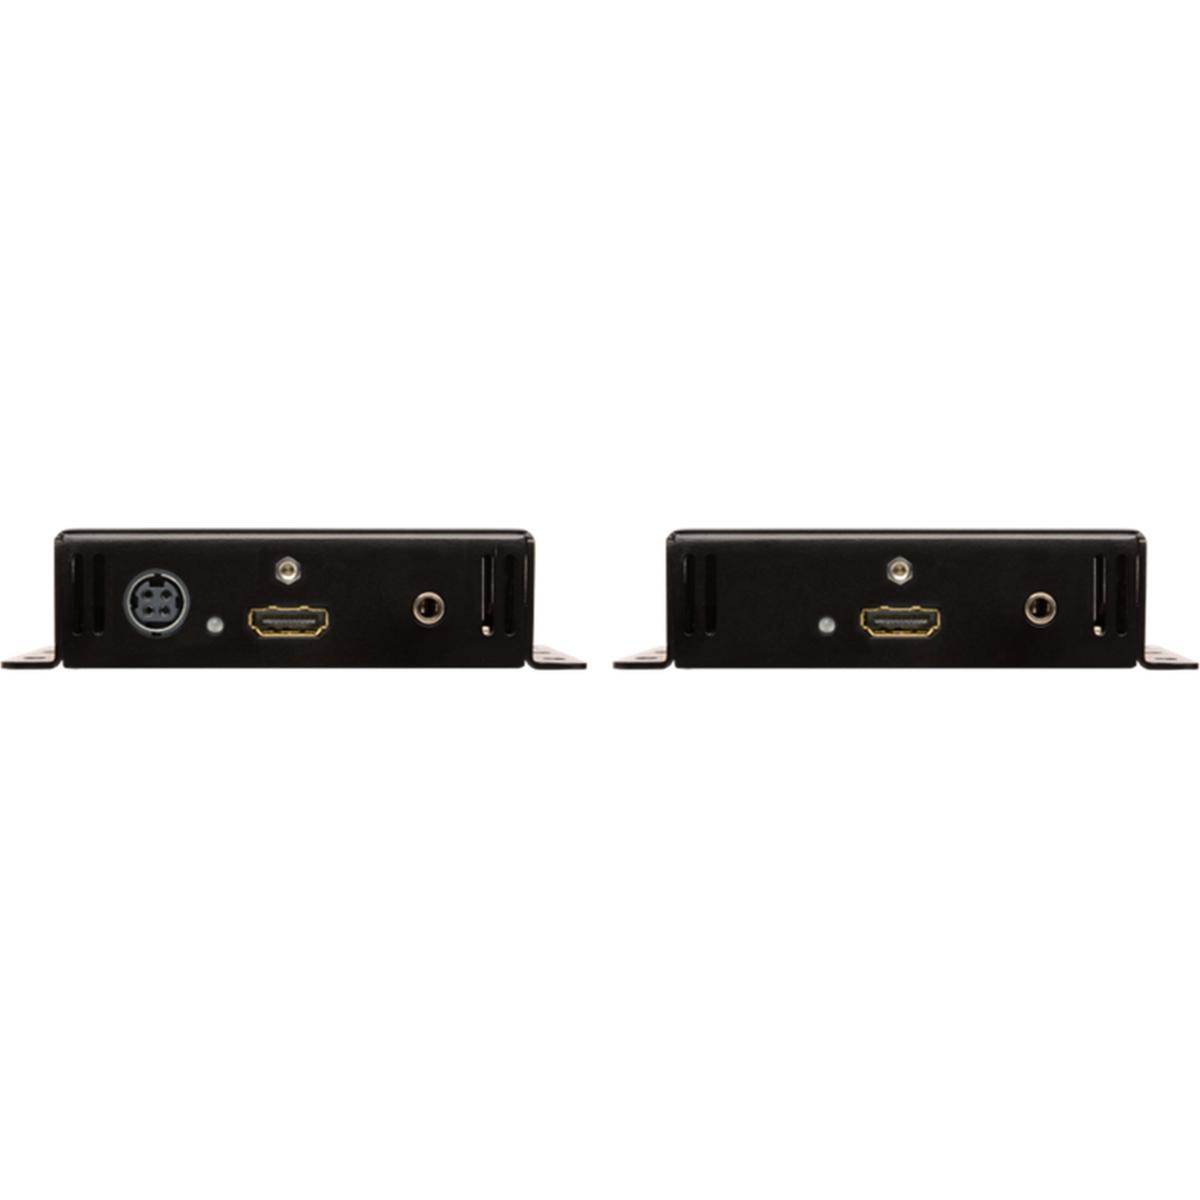 GTB-HDBT-POL-BLK Gefen Extender for HDMI with POL